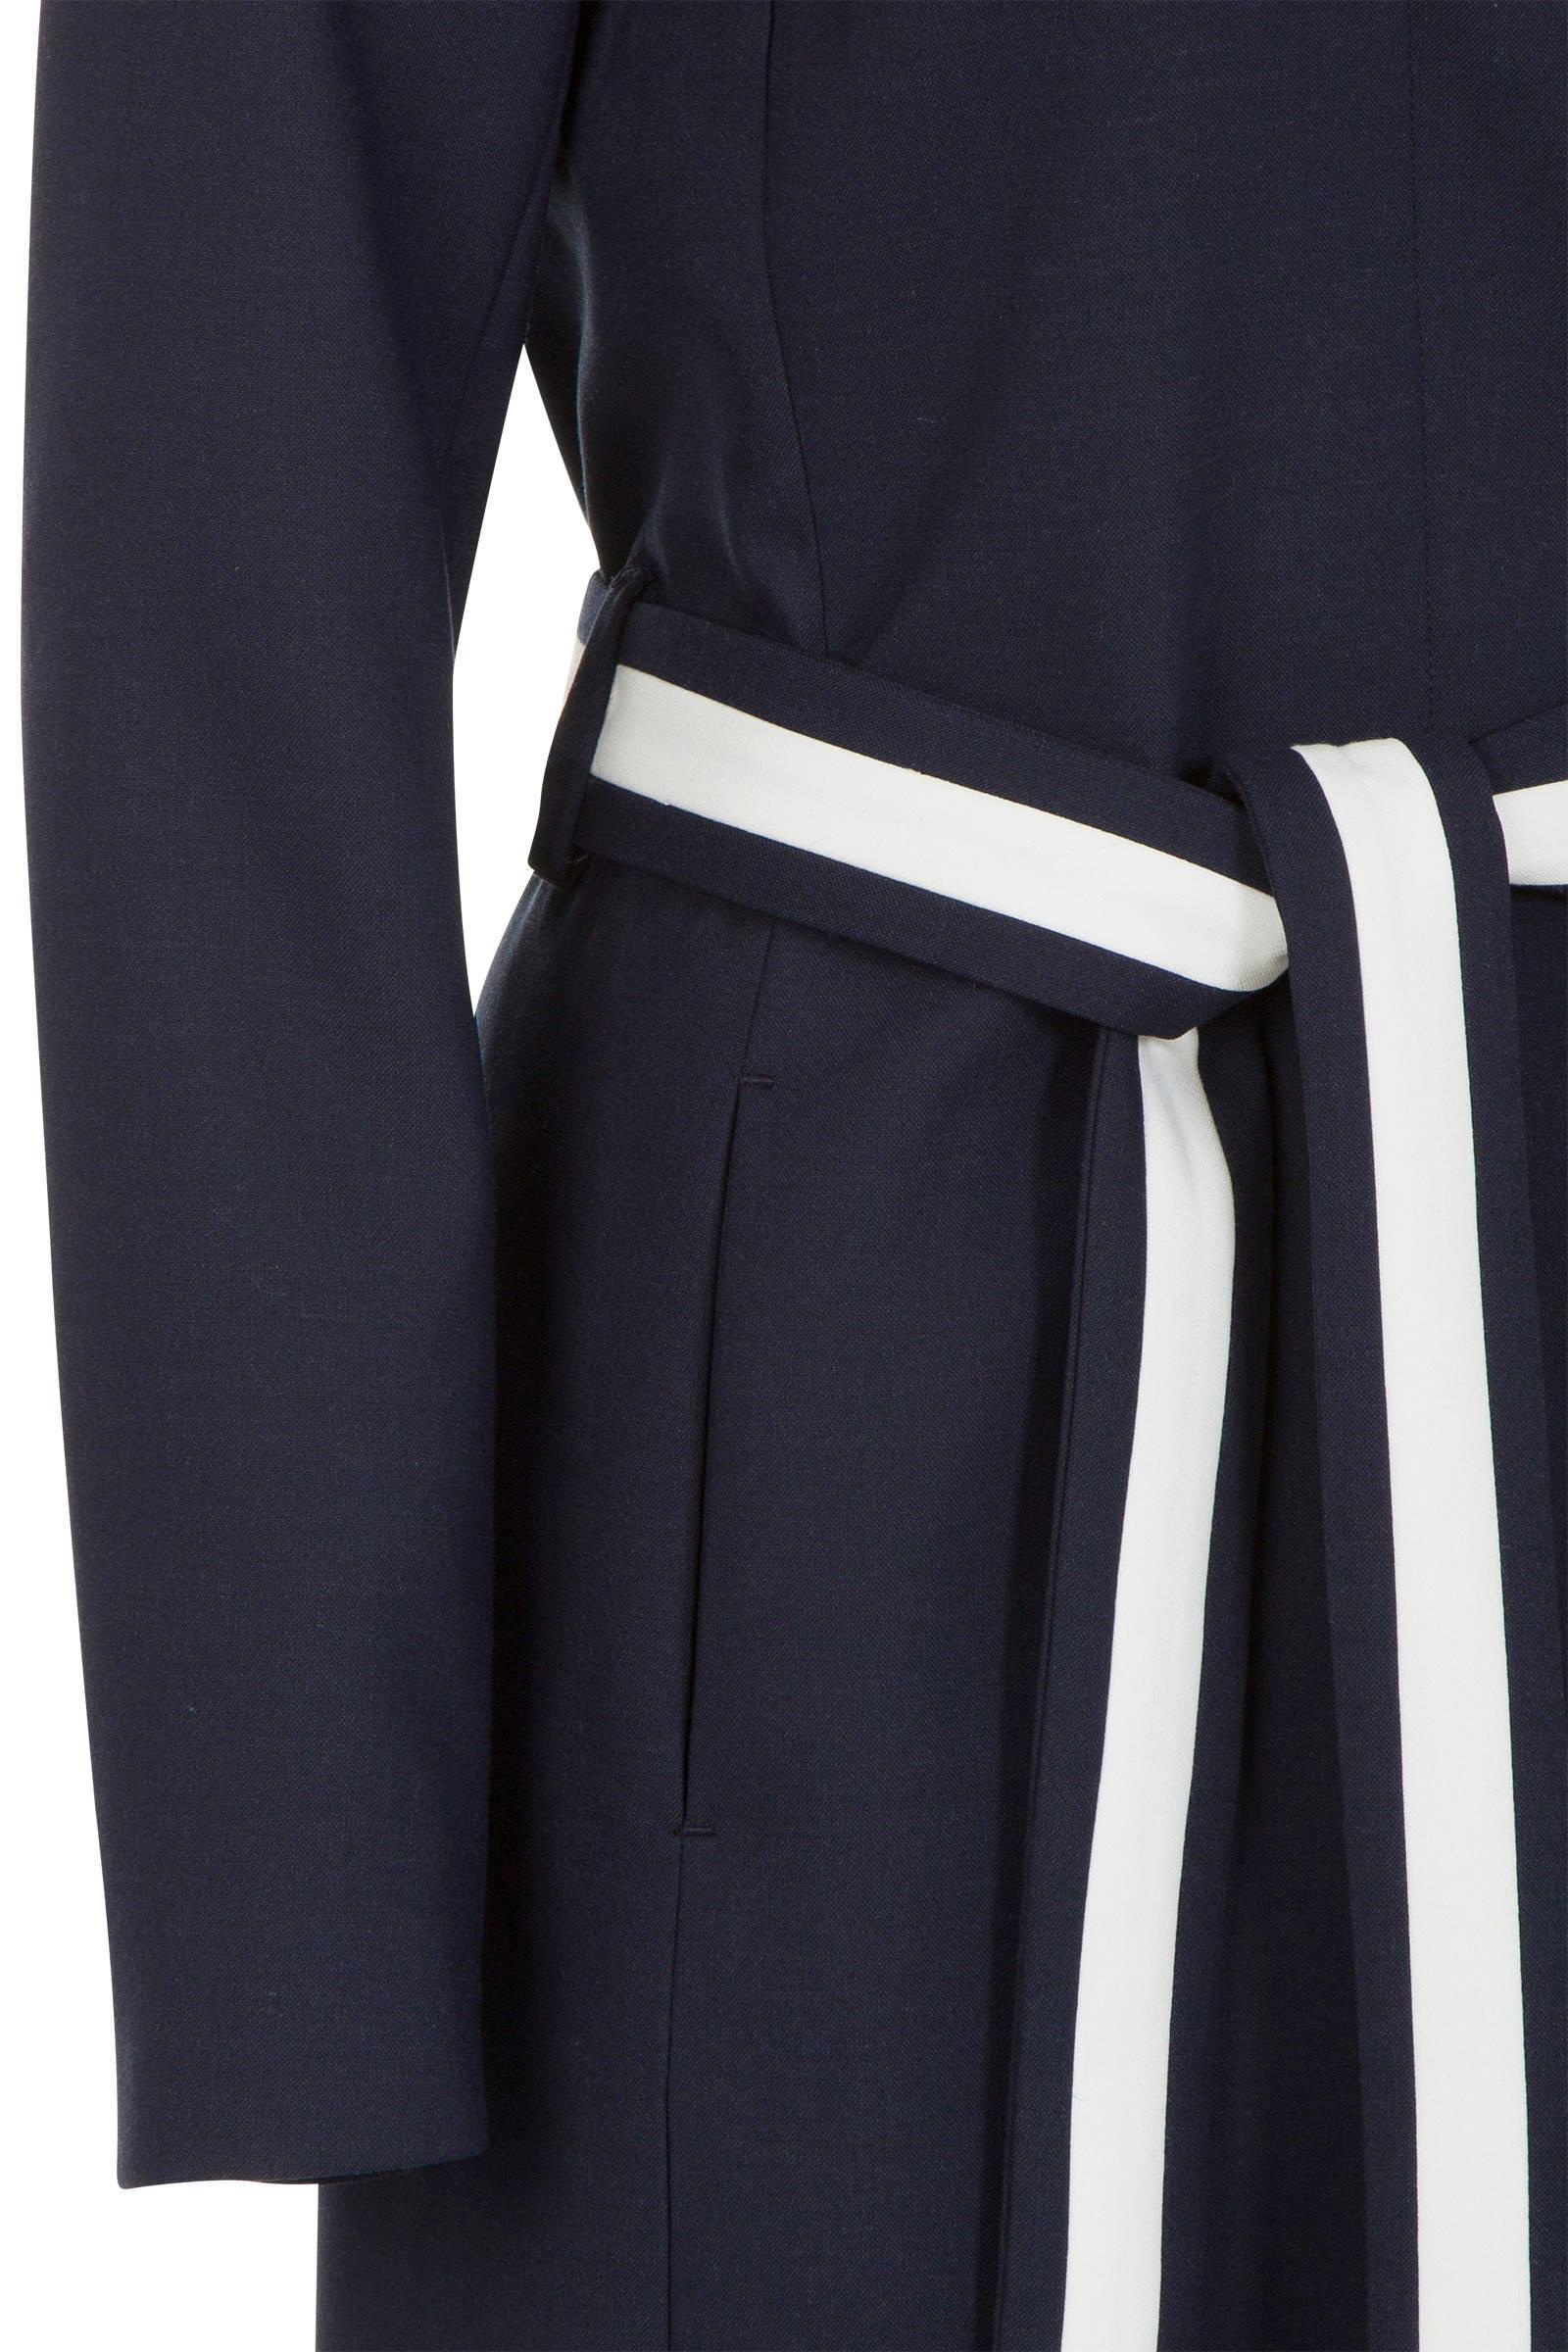 PROMISS zomerjas donkerblauwwit   wehkamp